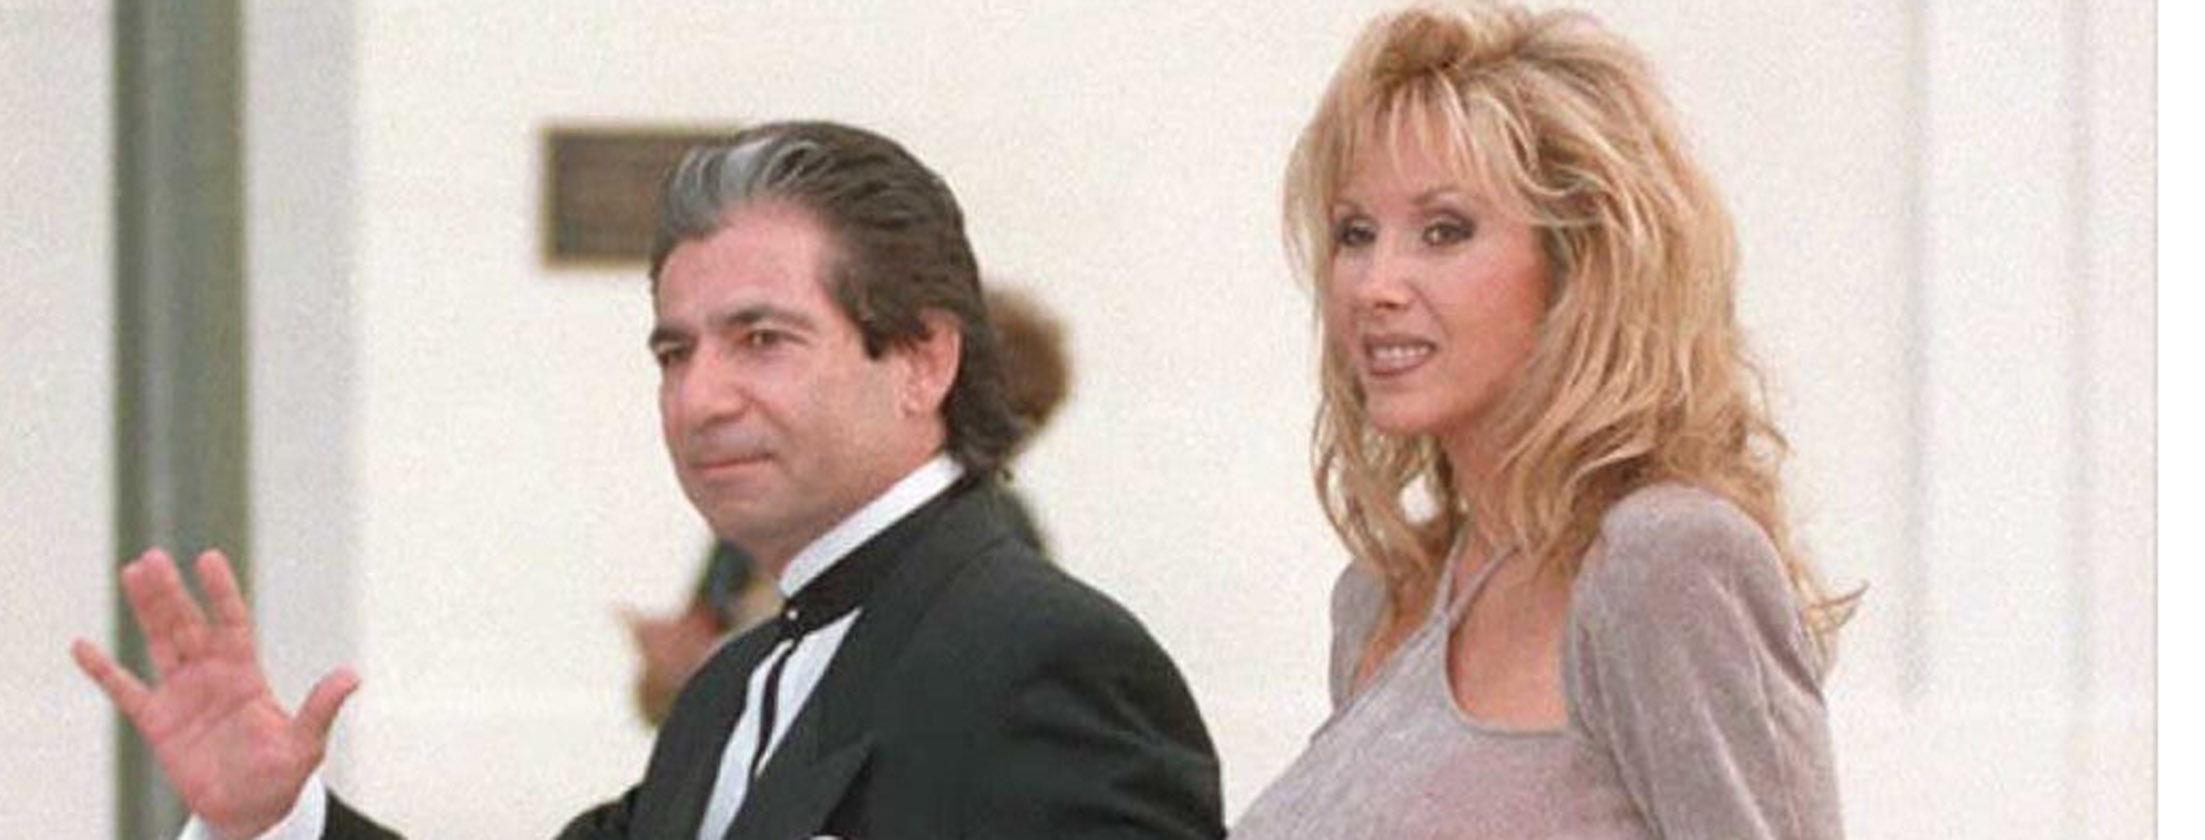 Attorney Robert Kardashian, who is a close friend